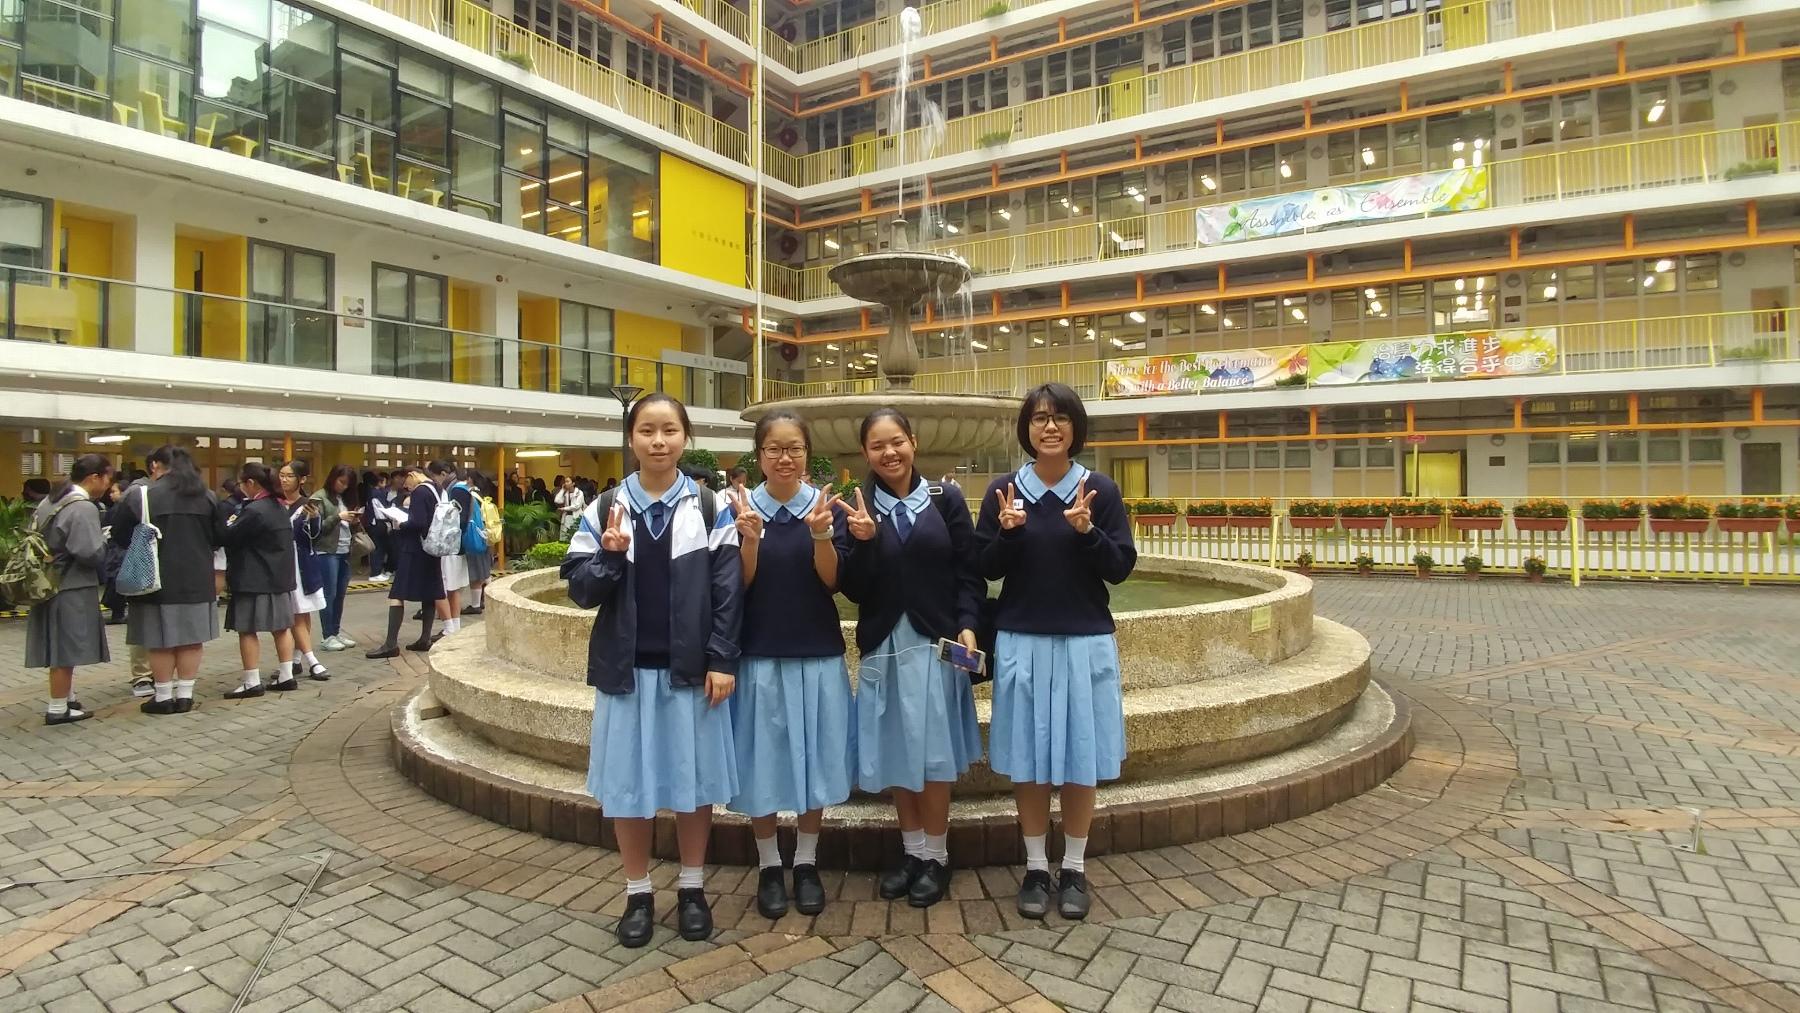 http://npc.edu.hk/sites/default/files/002_1.jpg